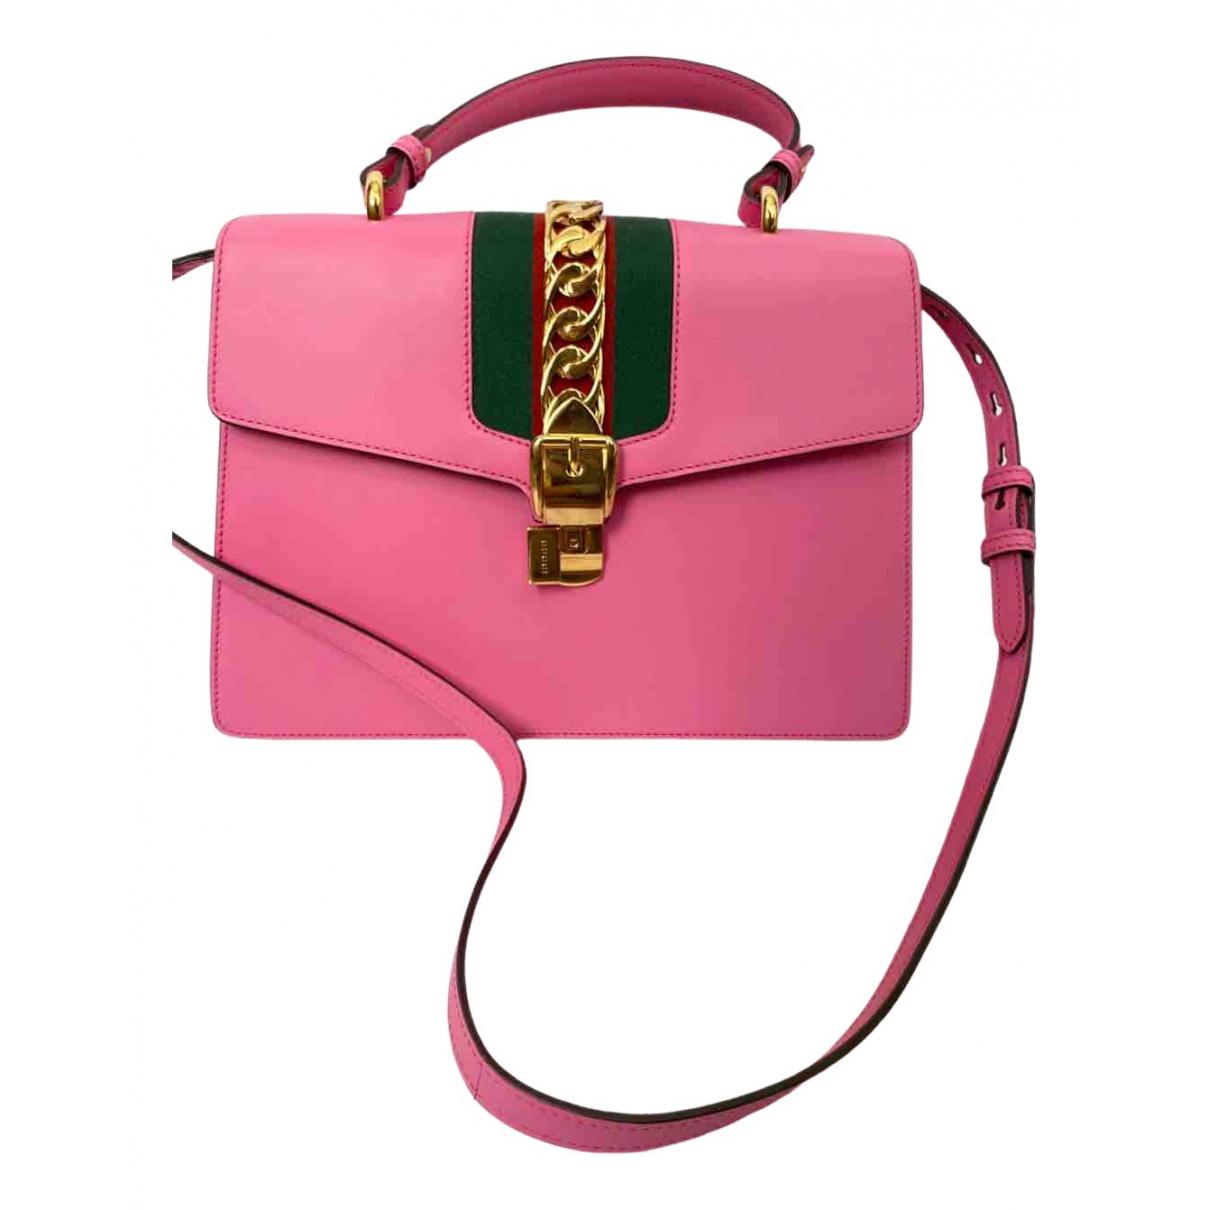 Gucci - Sac a main Sylvie pour femme en cuir - rose